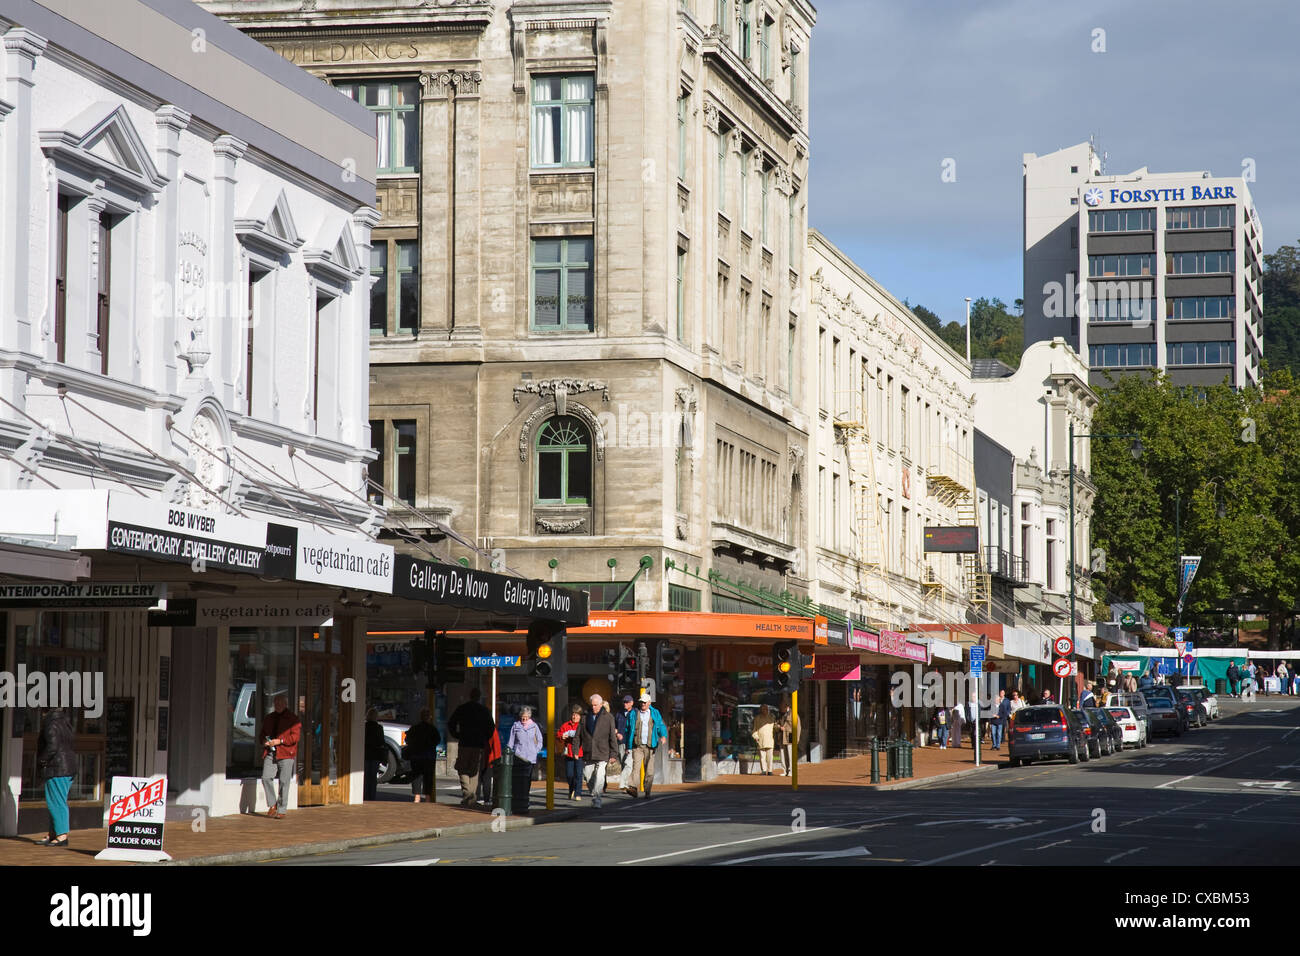 Stuart Street, Dunedin, Central Business District, Otago District, South Island, New Zealand, Pacific - Stock Image